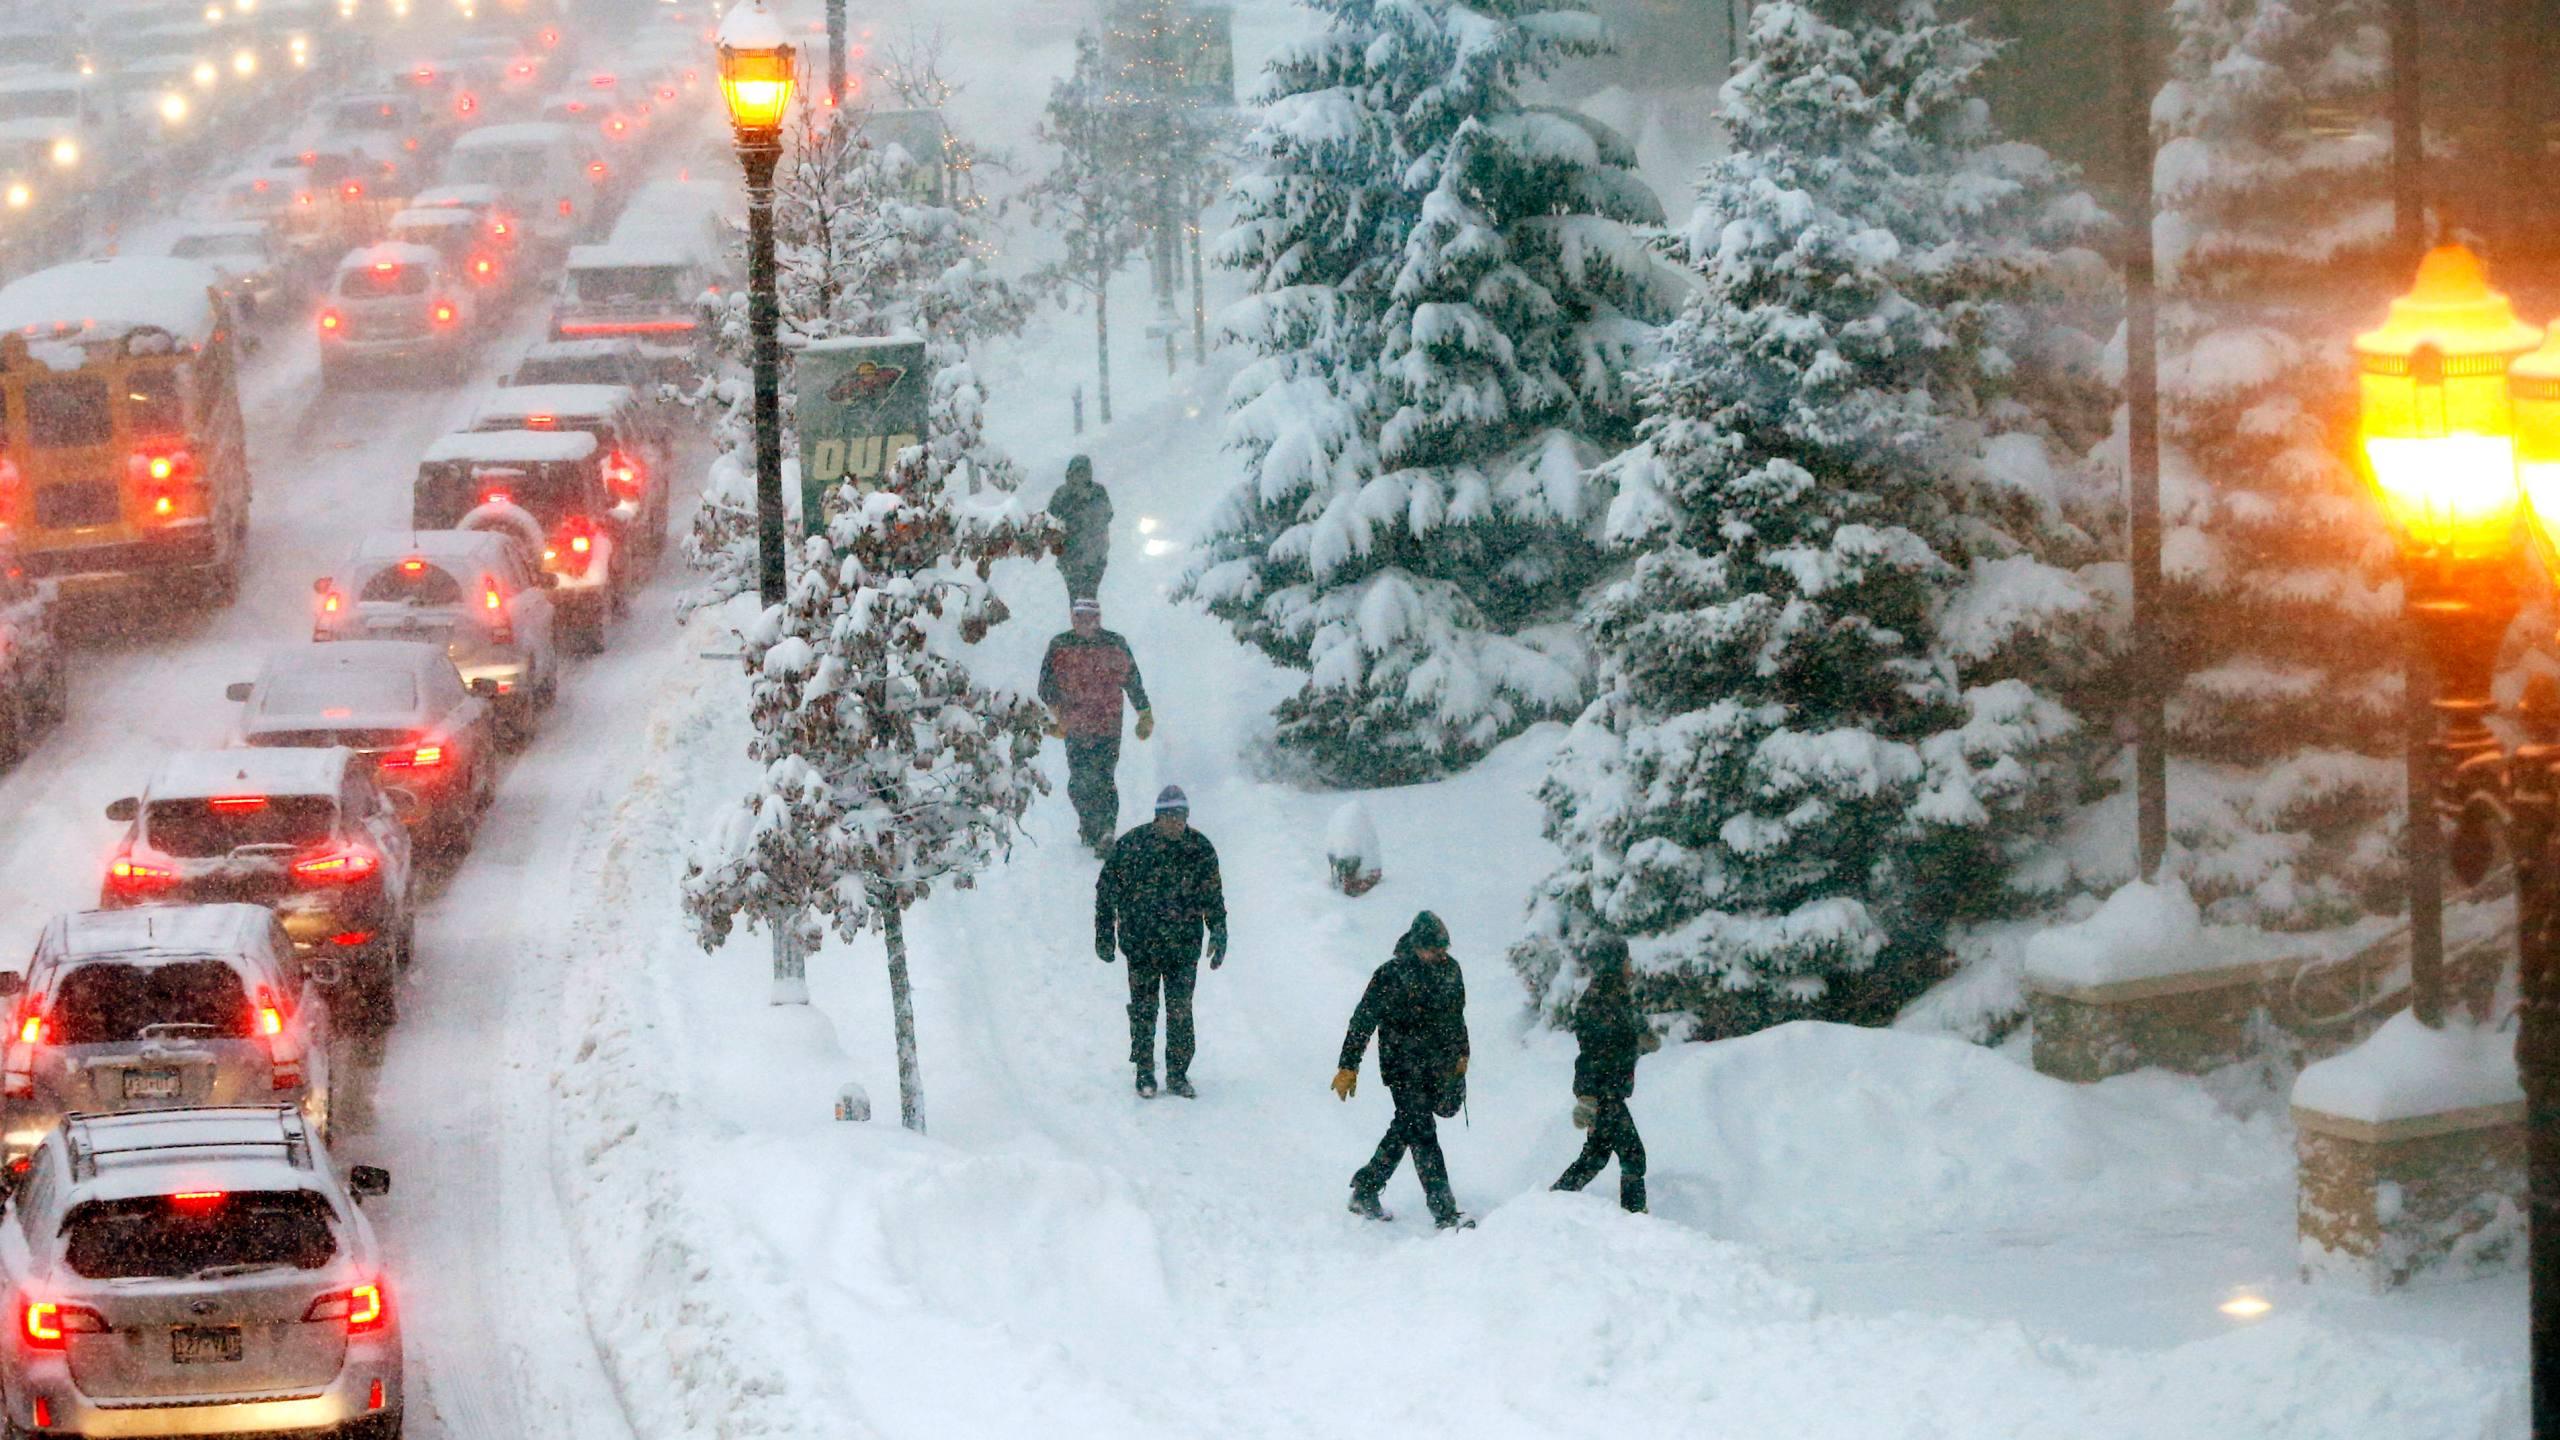 Winter_Storm_Minnesota_18225-159532.jpg61417356